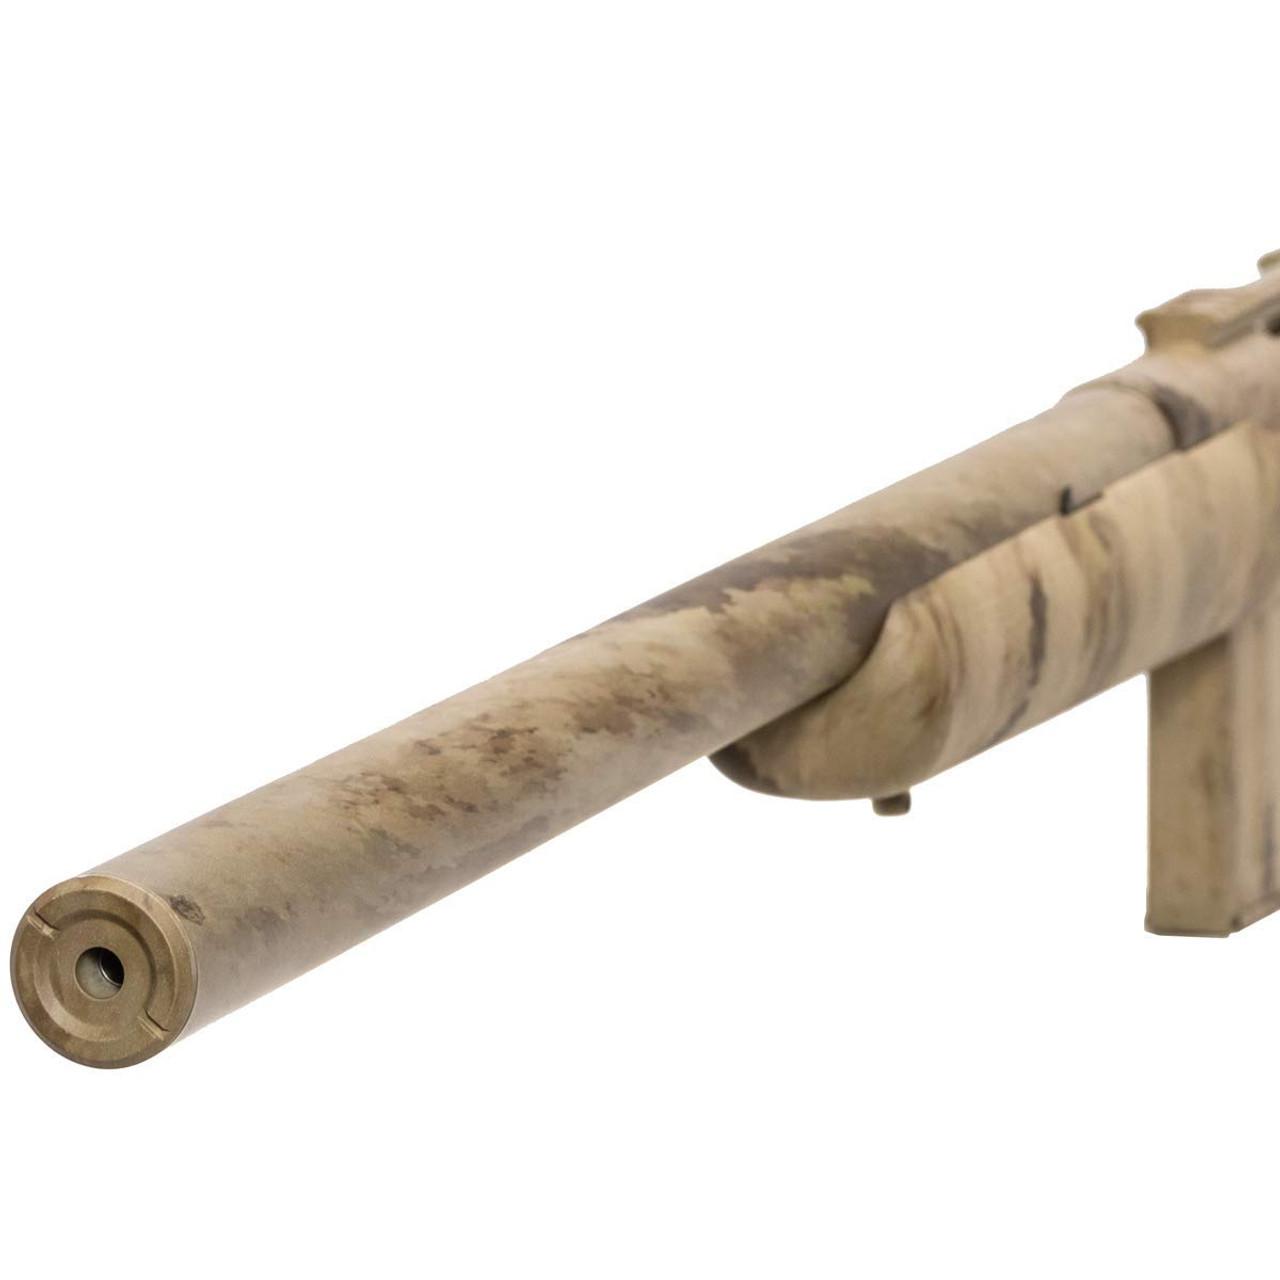 Muzzle left of APS APM40A3 Airsoft Sniper Rifle Gun